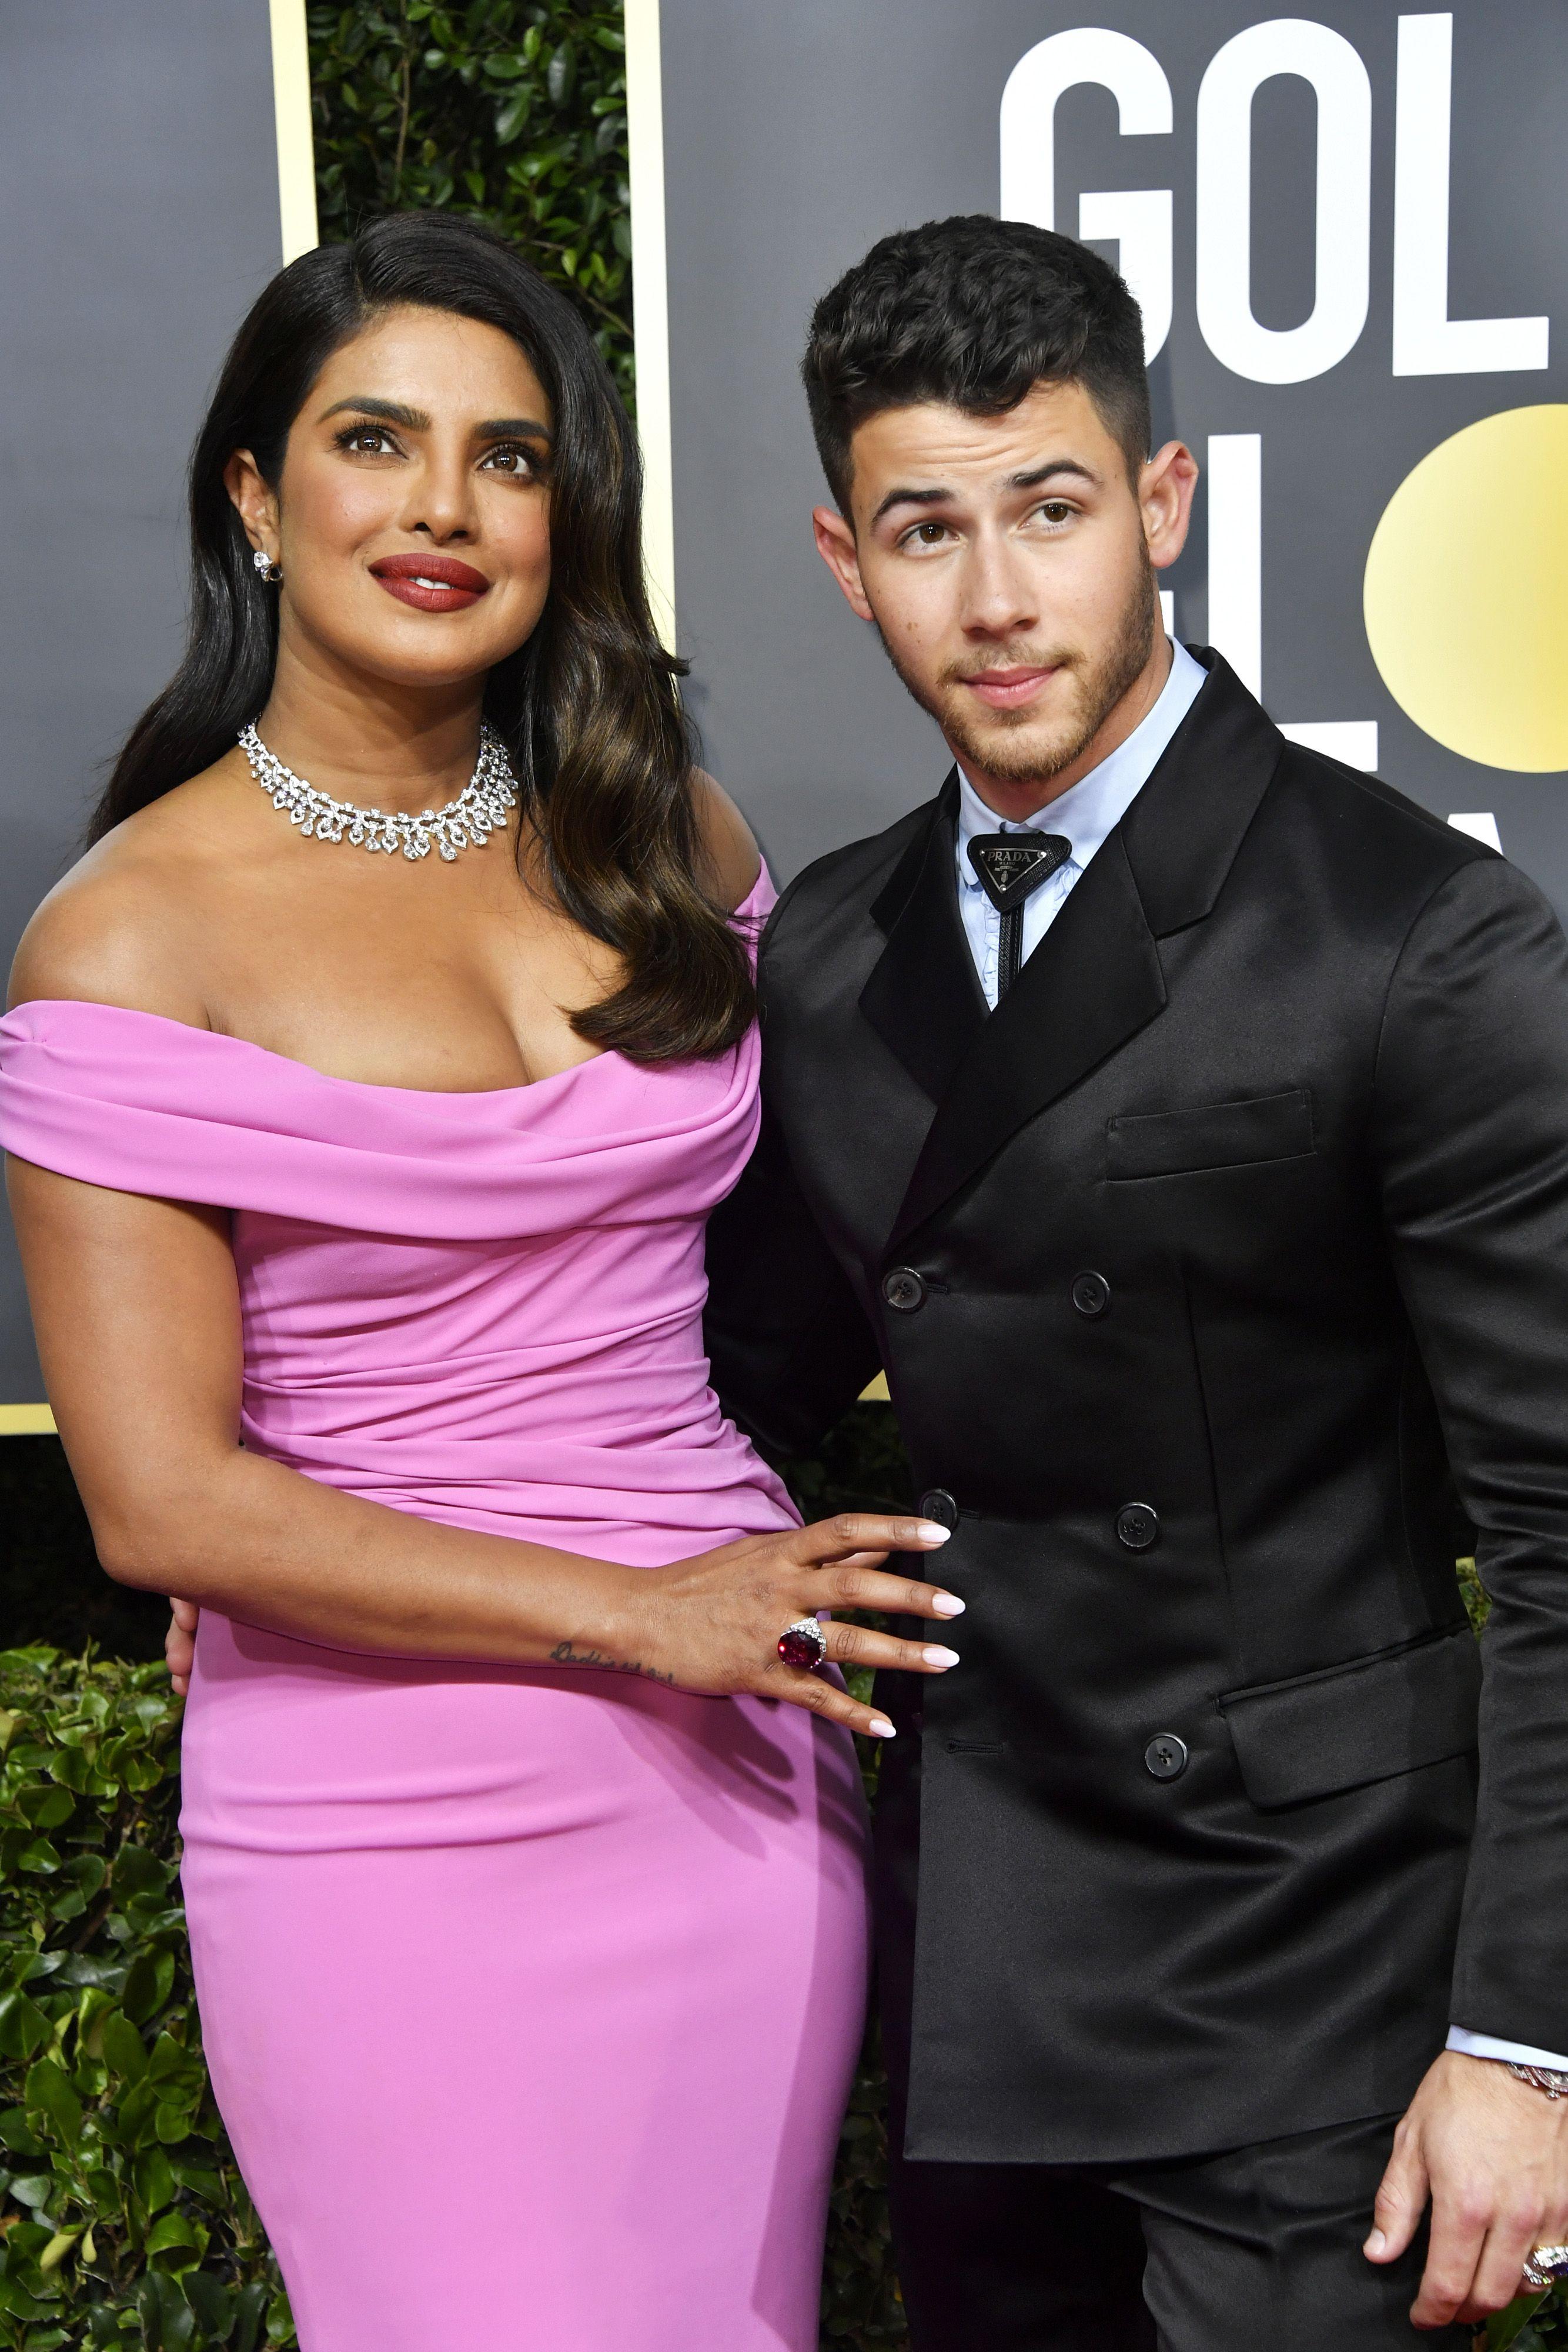 Are Priyanka Chopra And Nick Jonas' Social Media Posts Too Staged?